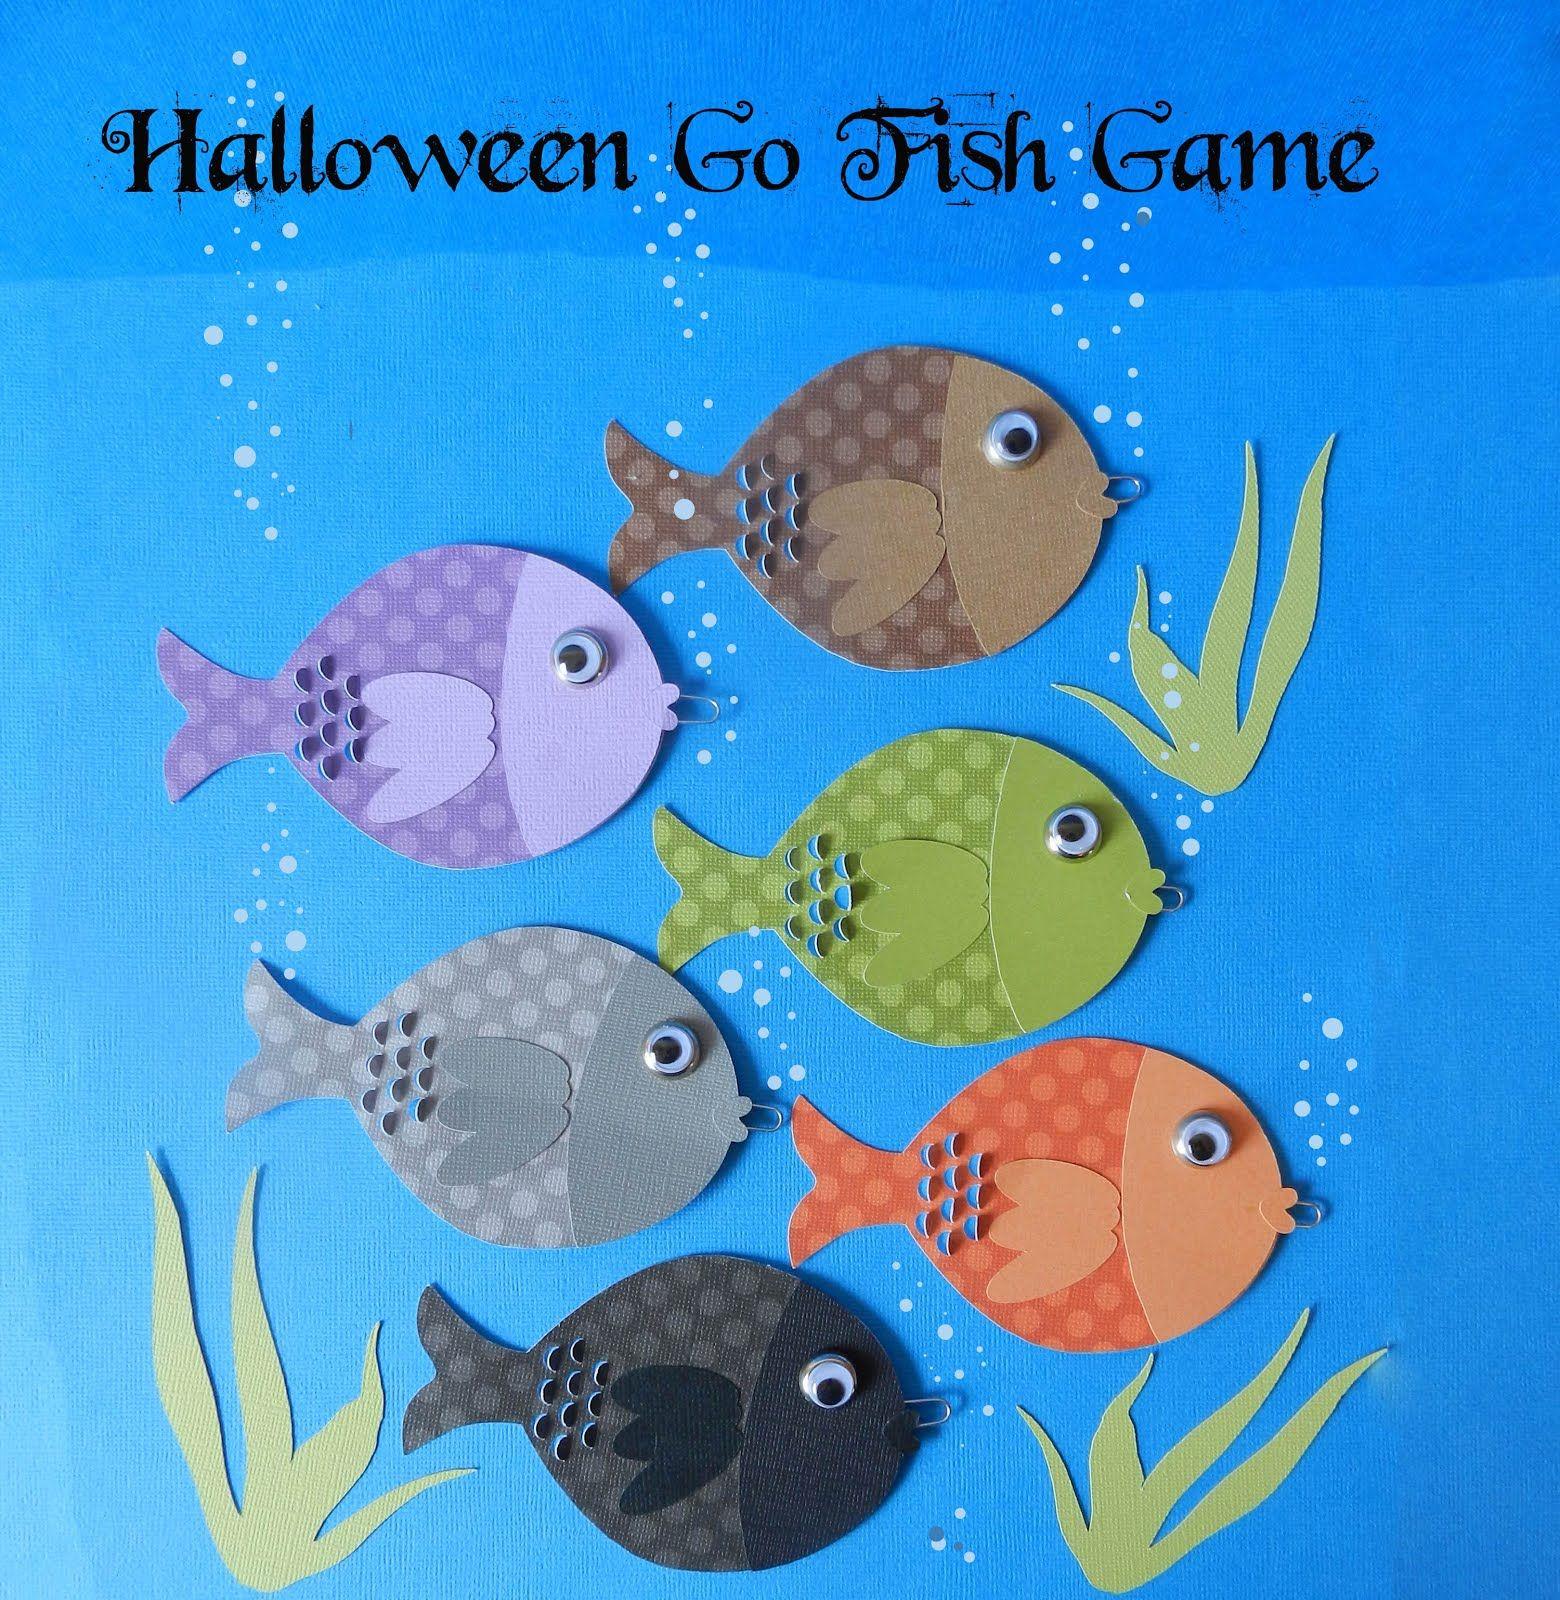 Go Fish game perfect for home parties, classroom parties, school carnivals, neighborhood parties #HalloweenParties #HalloweenGames